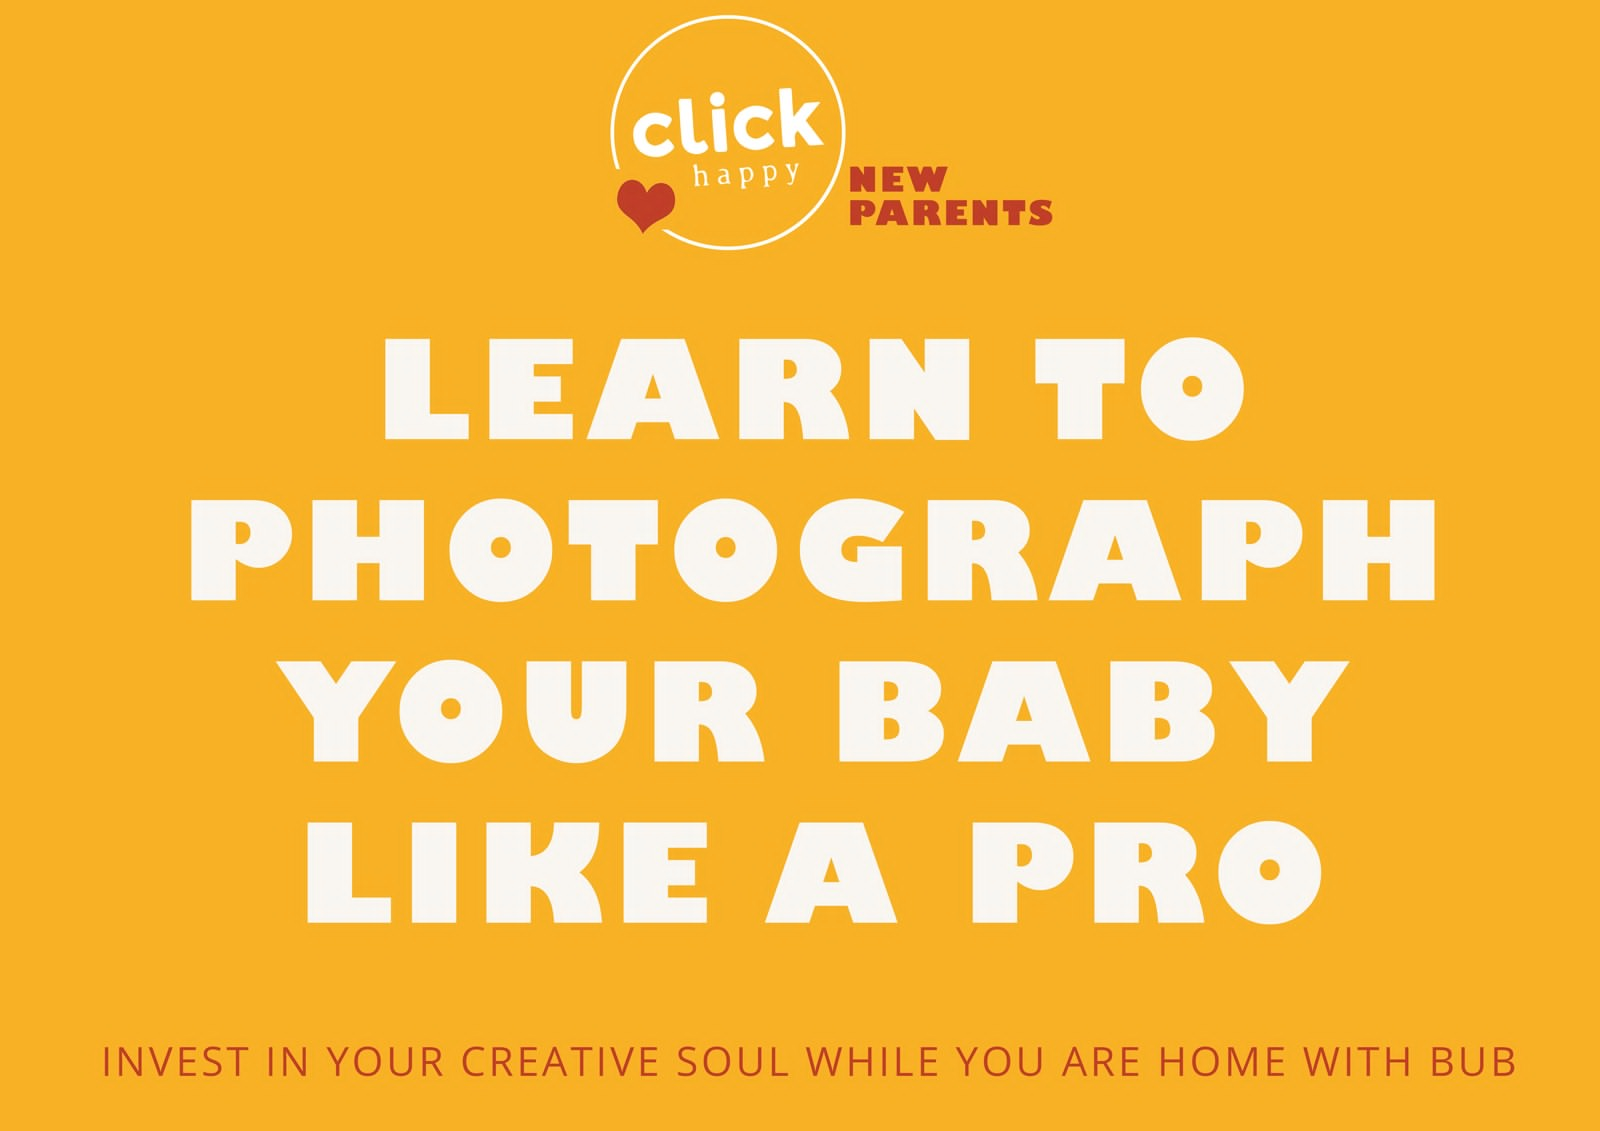 Photograph like a pro